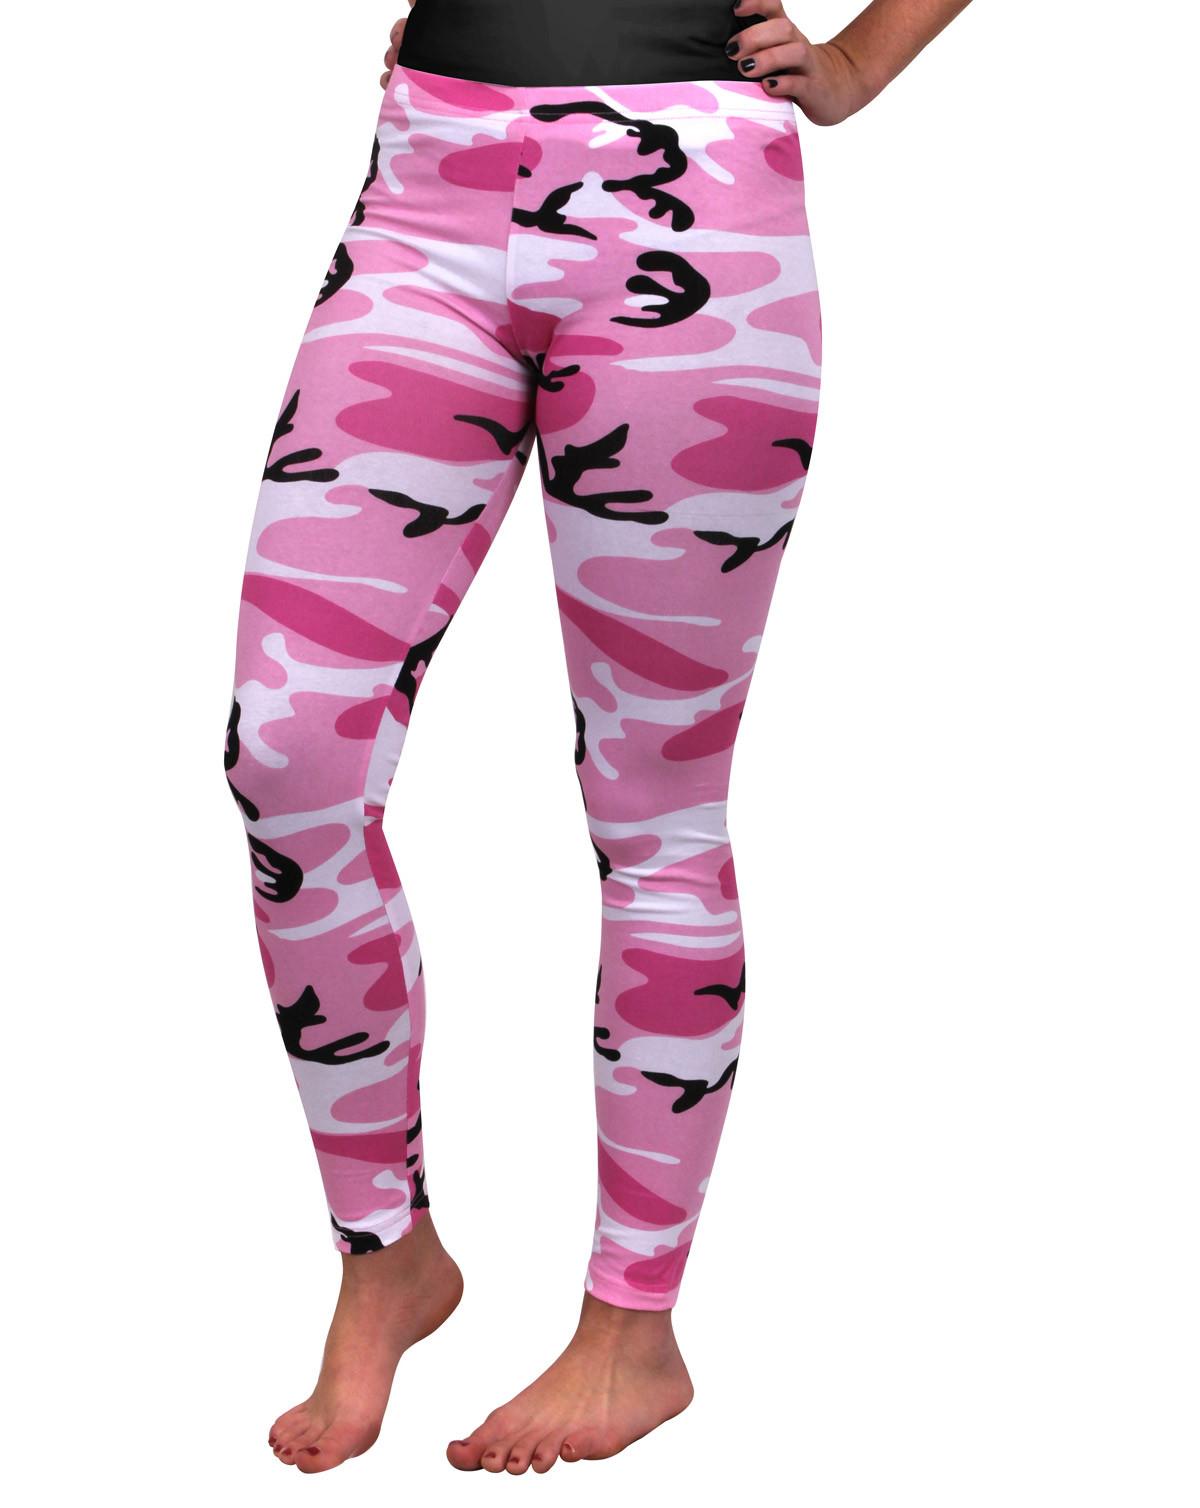 Image of   Rothco Camouflage Leggings (Pink Camo, 2XL)